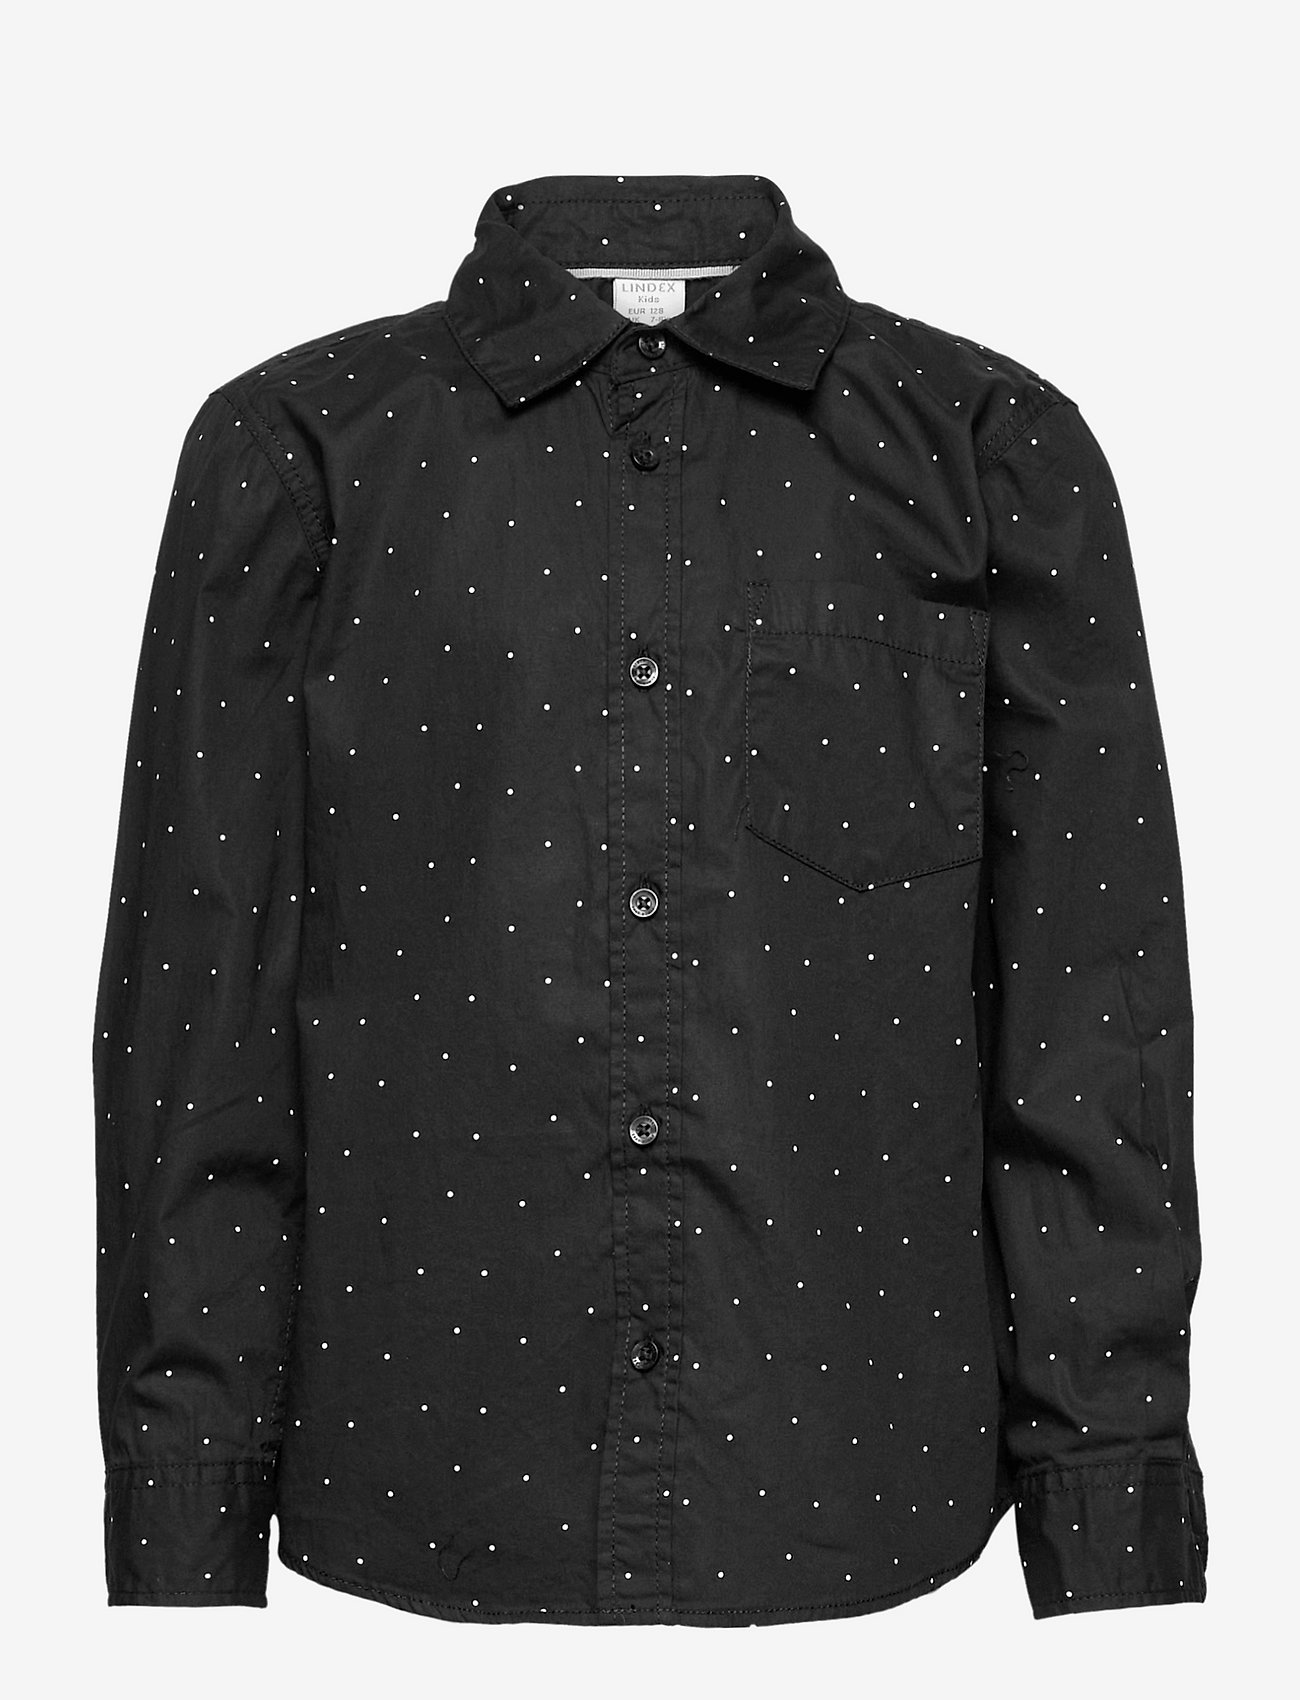 Lindex - Shirt check party aop - overhemden - black - 0